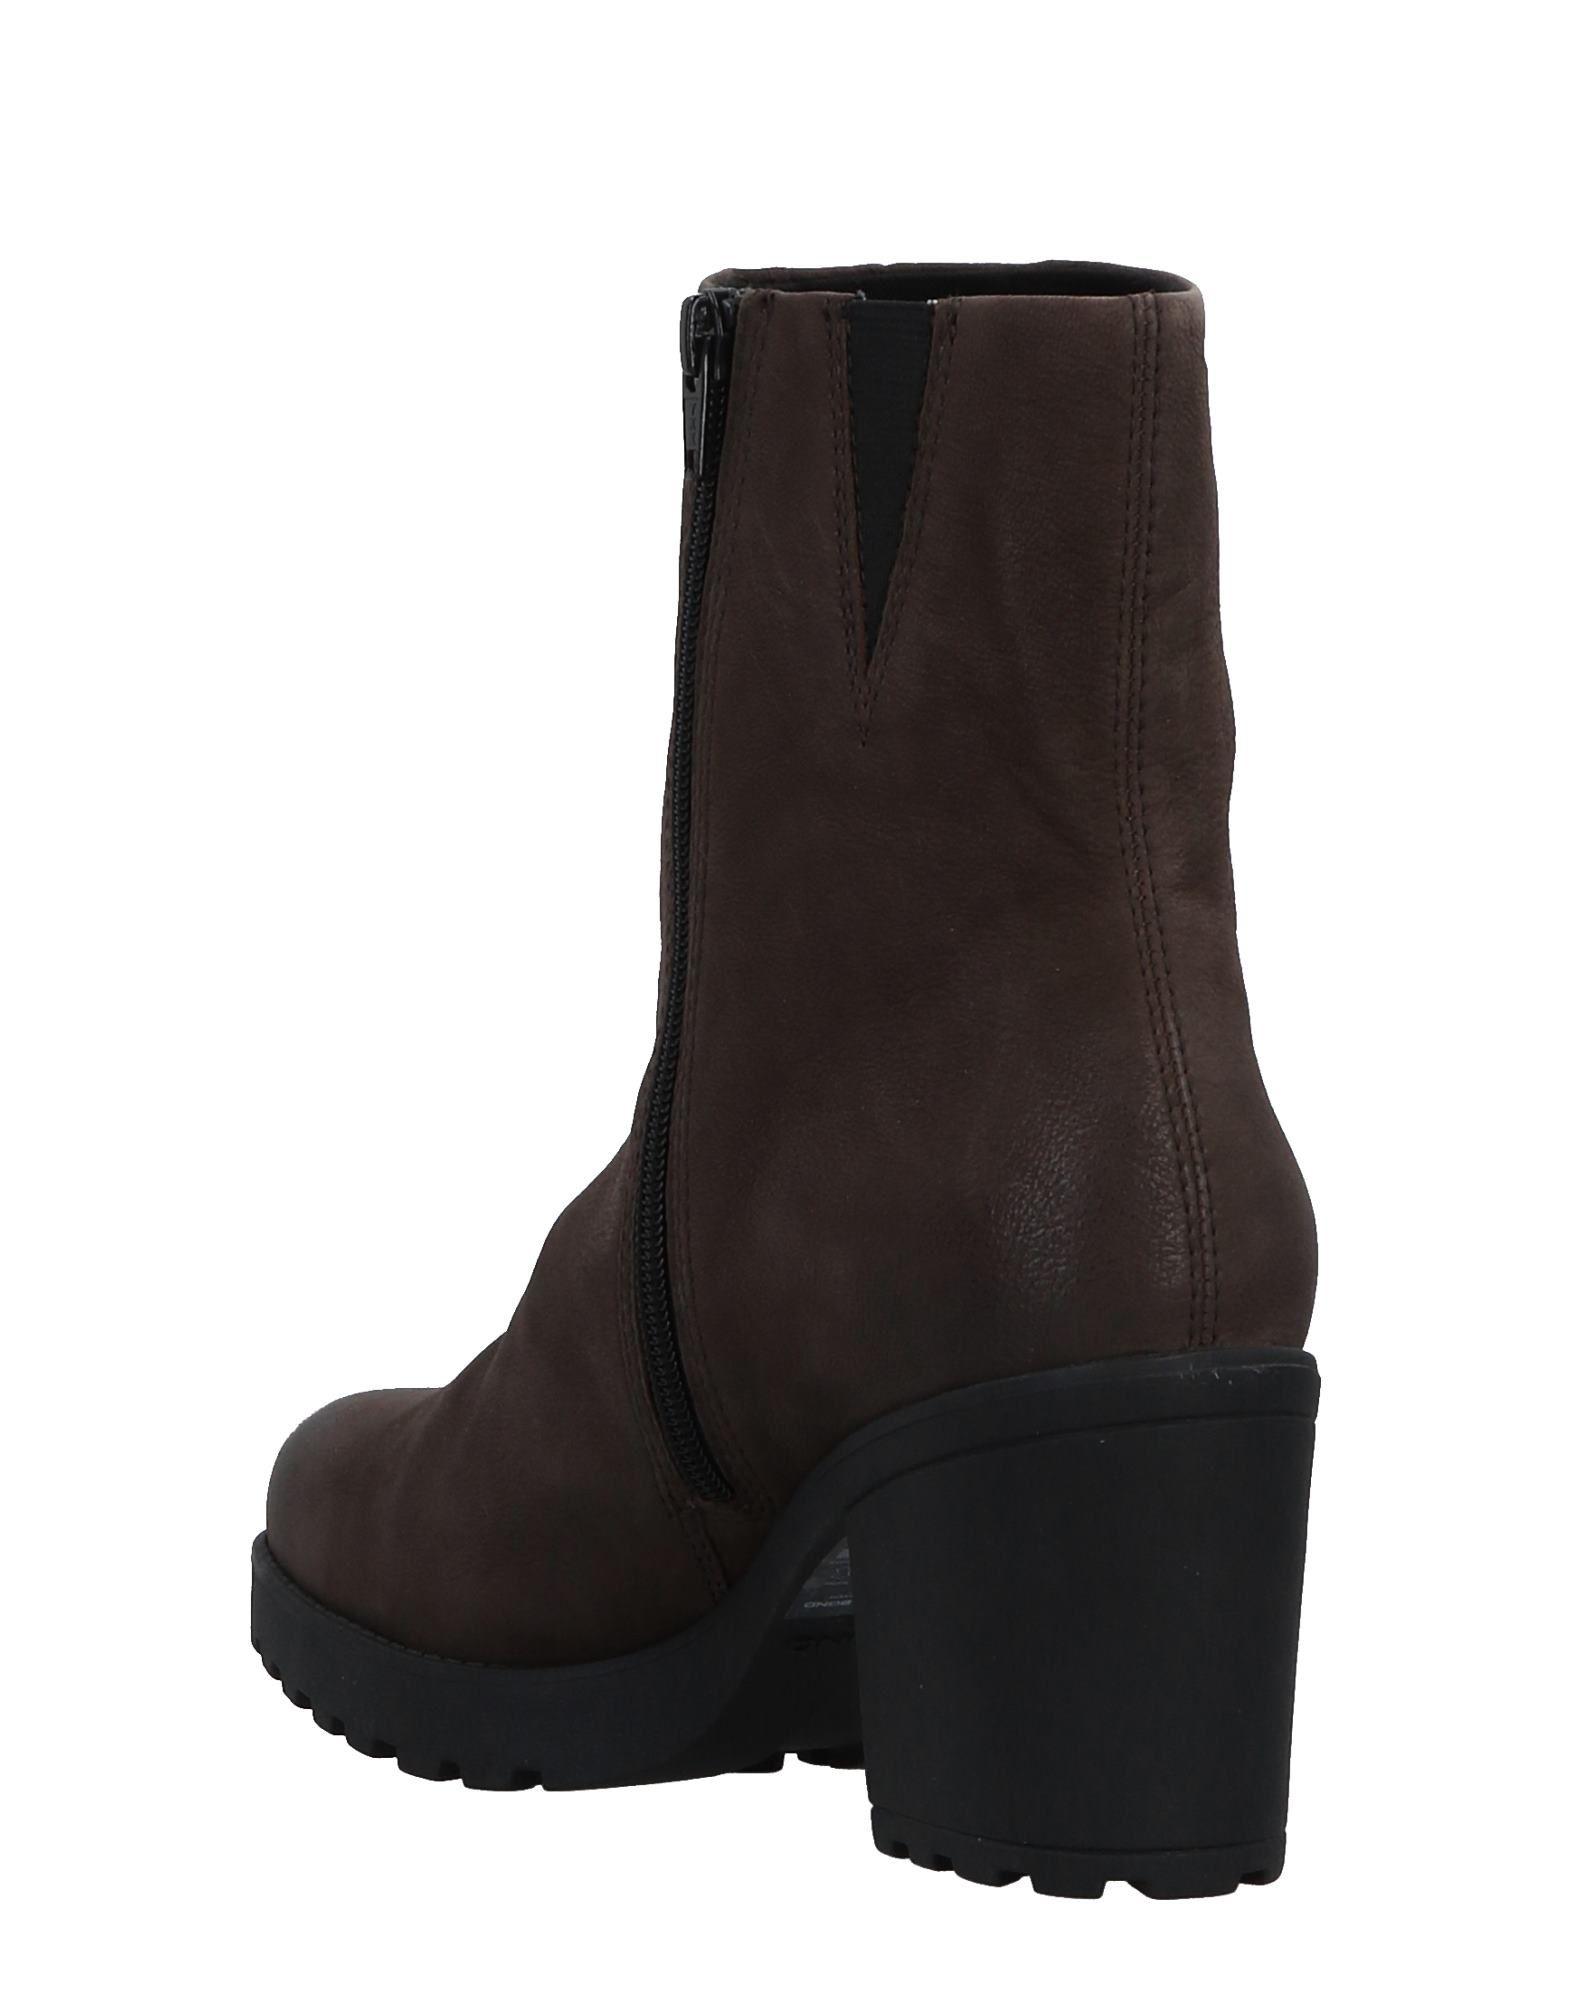 Gut um billige Schuhe Damen zu tragenVagabond Shoemakers Stiefelette Damen Schuhe  11513058BR e924ff